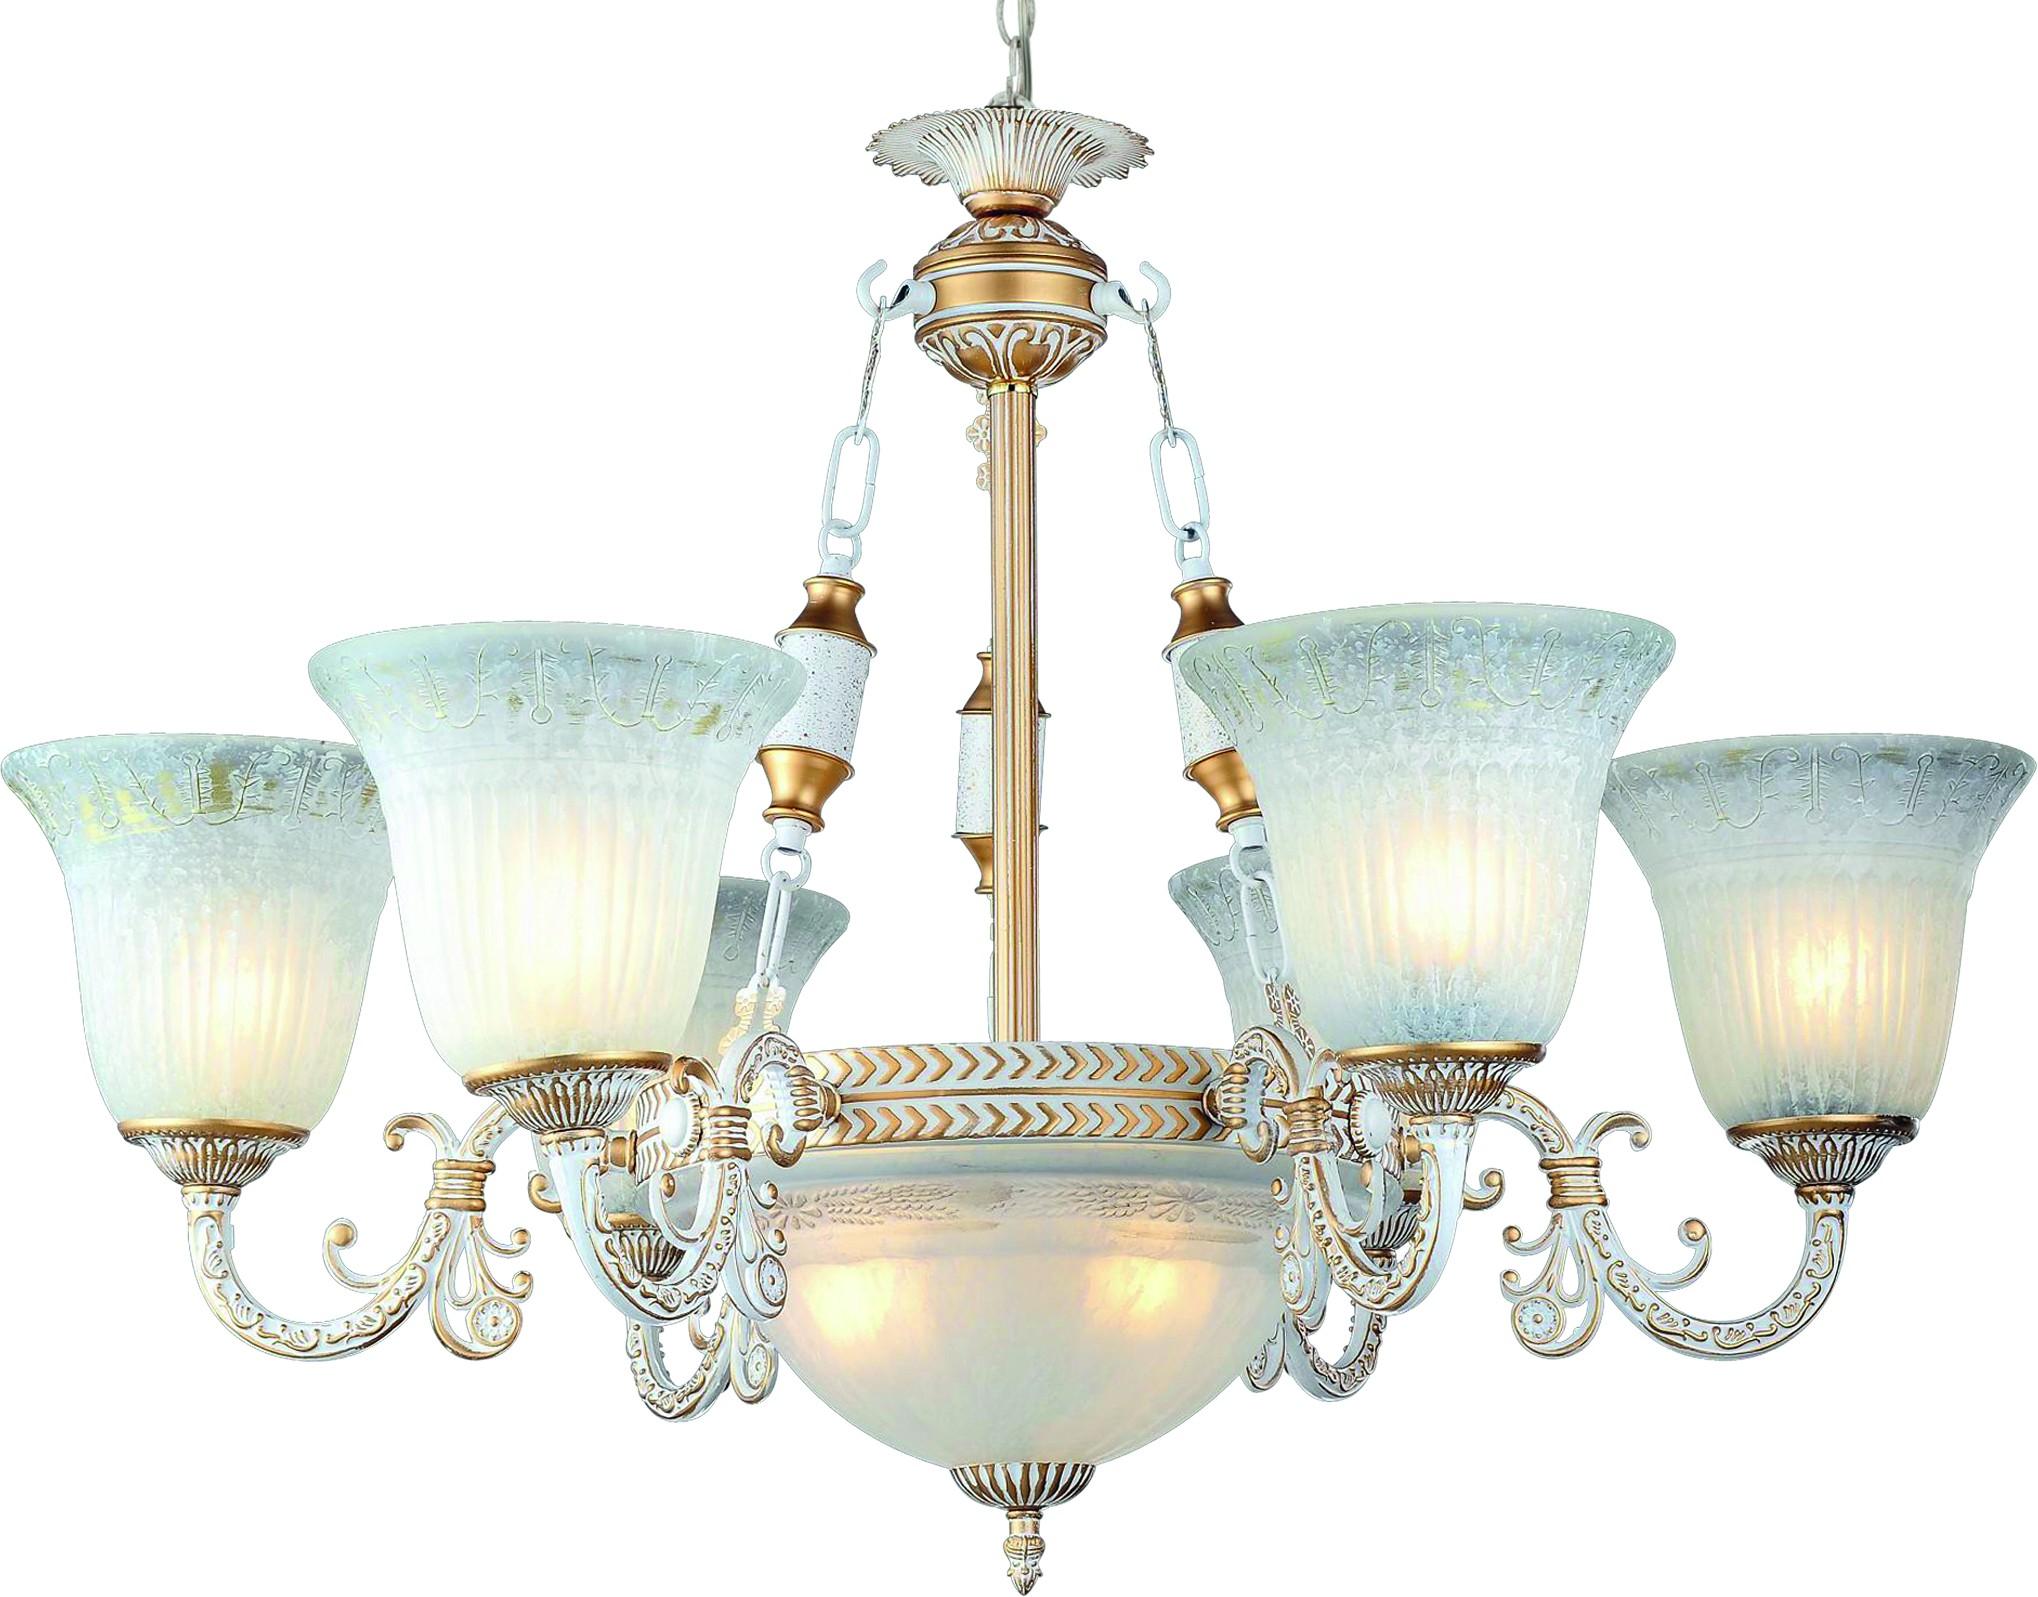 Люстра Arte lamp A1032lm-6-3wg люстра на штанге arte lamp delizia a1032lm 6 3wg